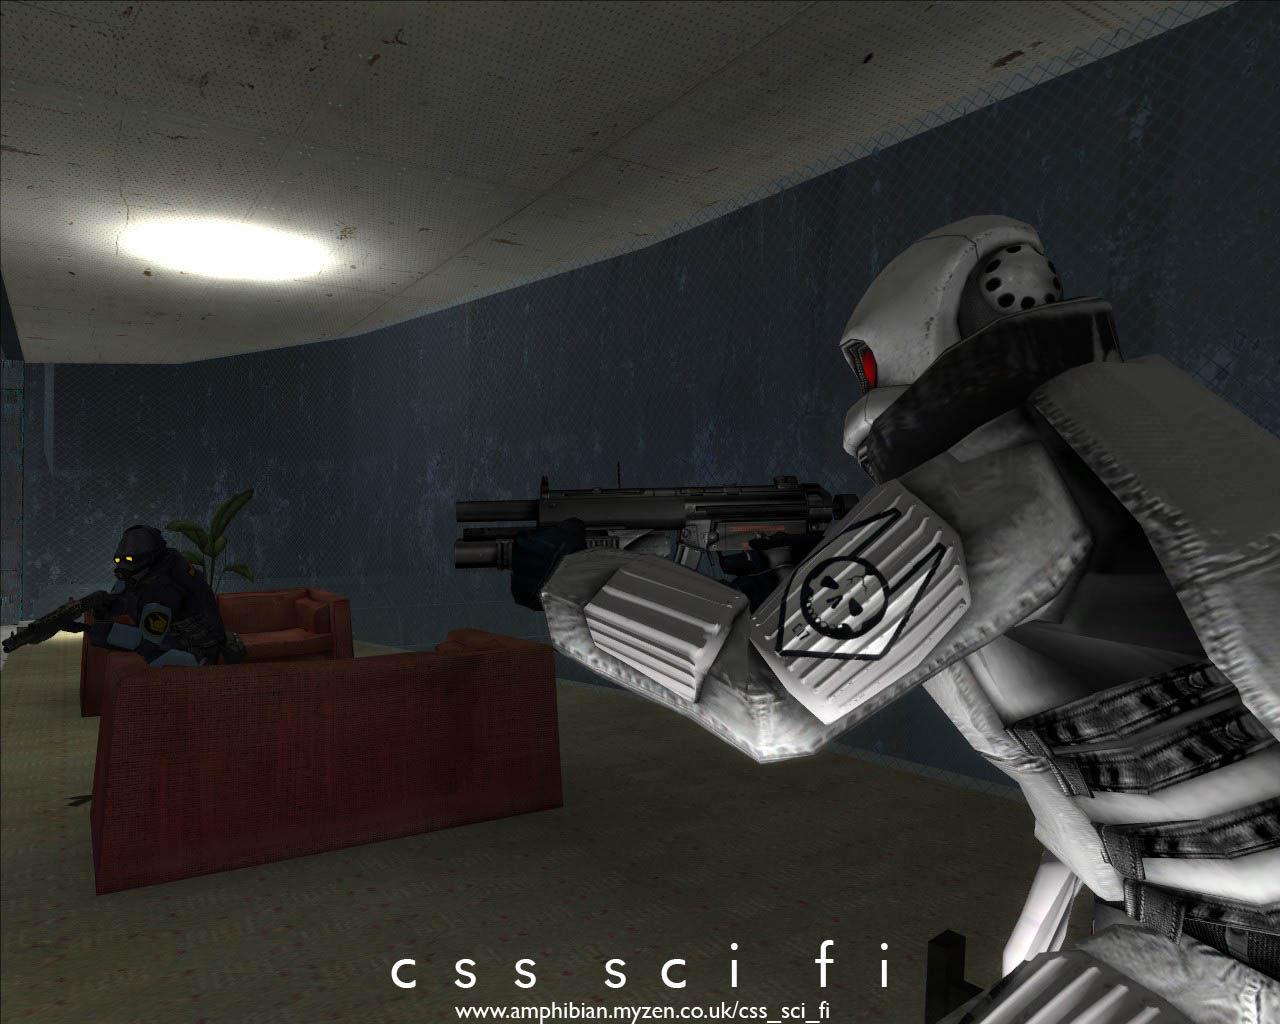 CSS SCI FI 2.0 Full Installer - Half-Life 2 Mods   GameWatcher